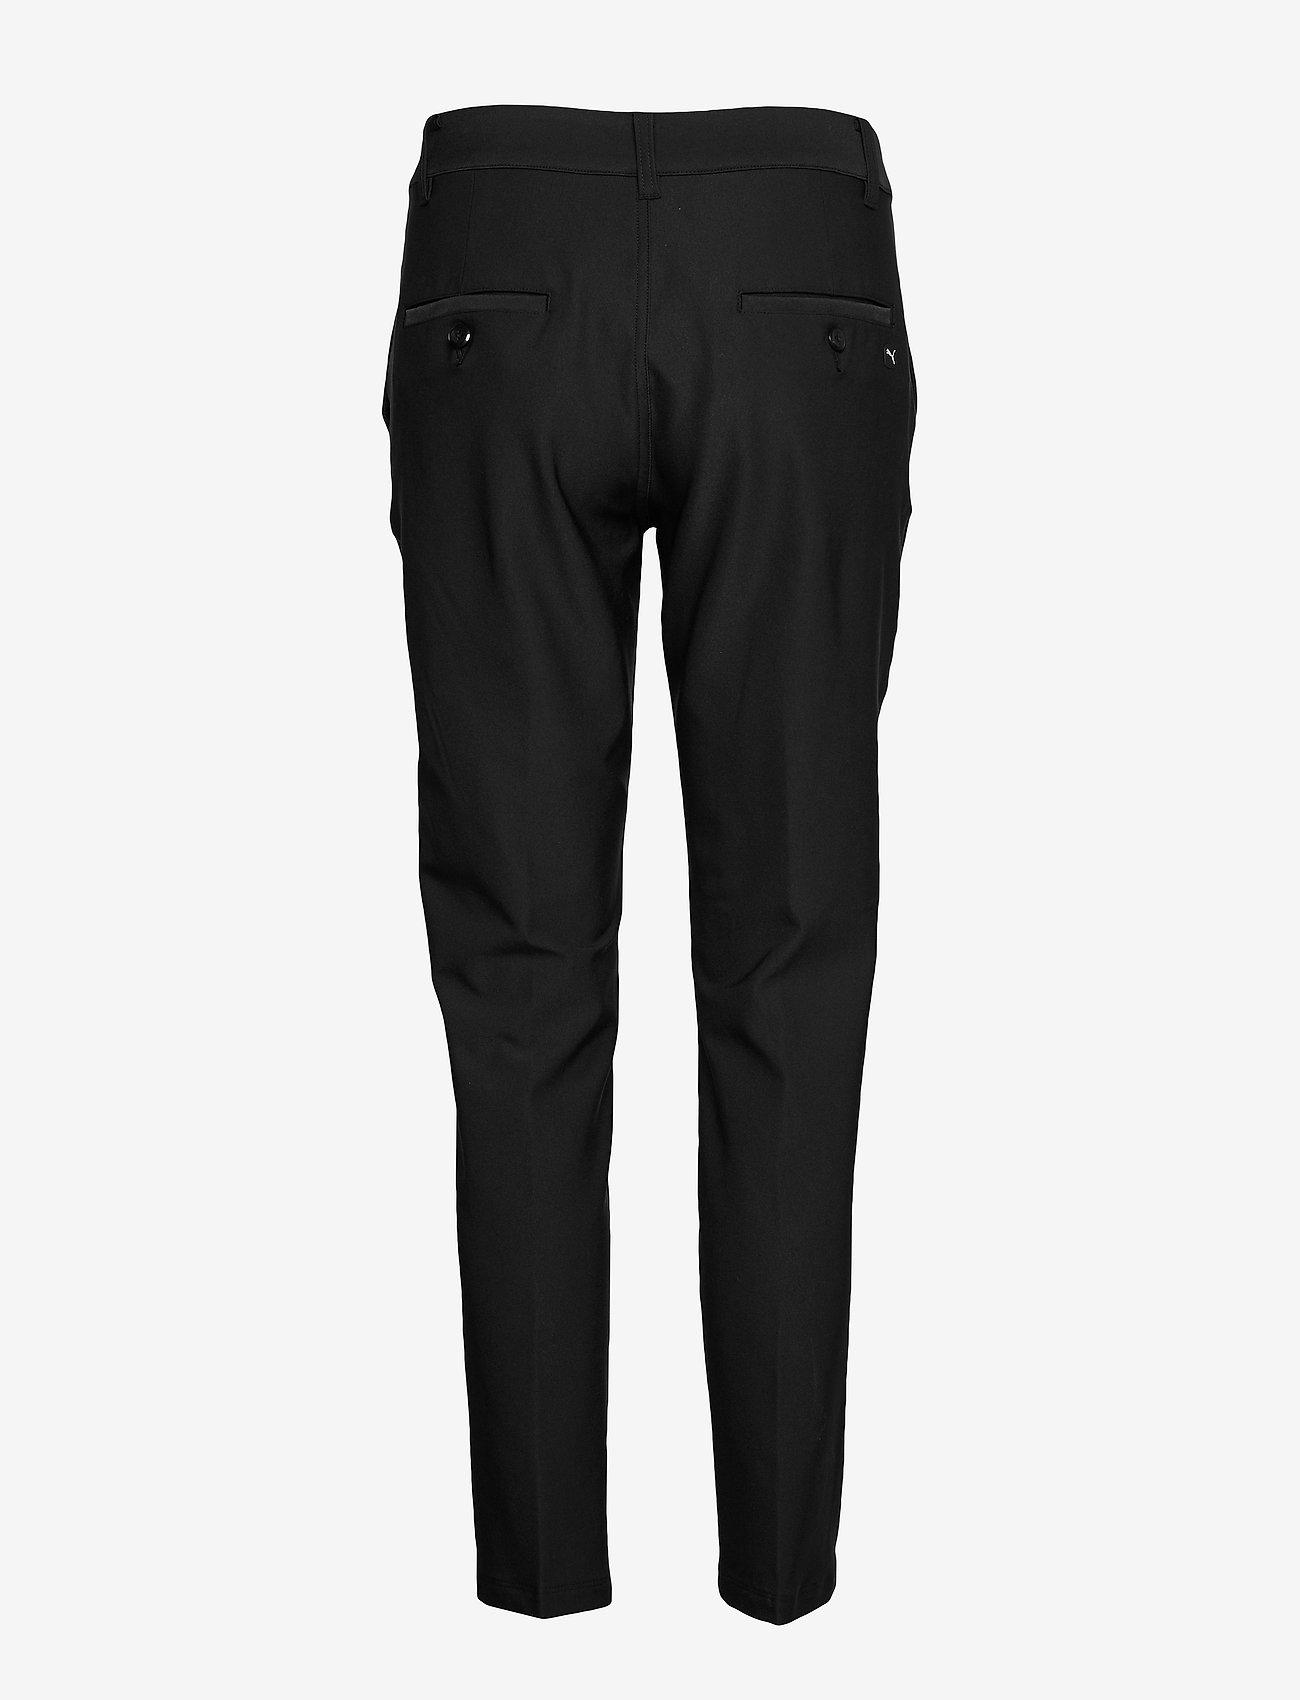 PUMA Golf - W Golf Pant - golfbroeken - puma black - 1